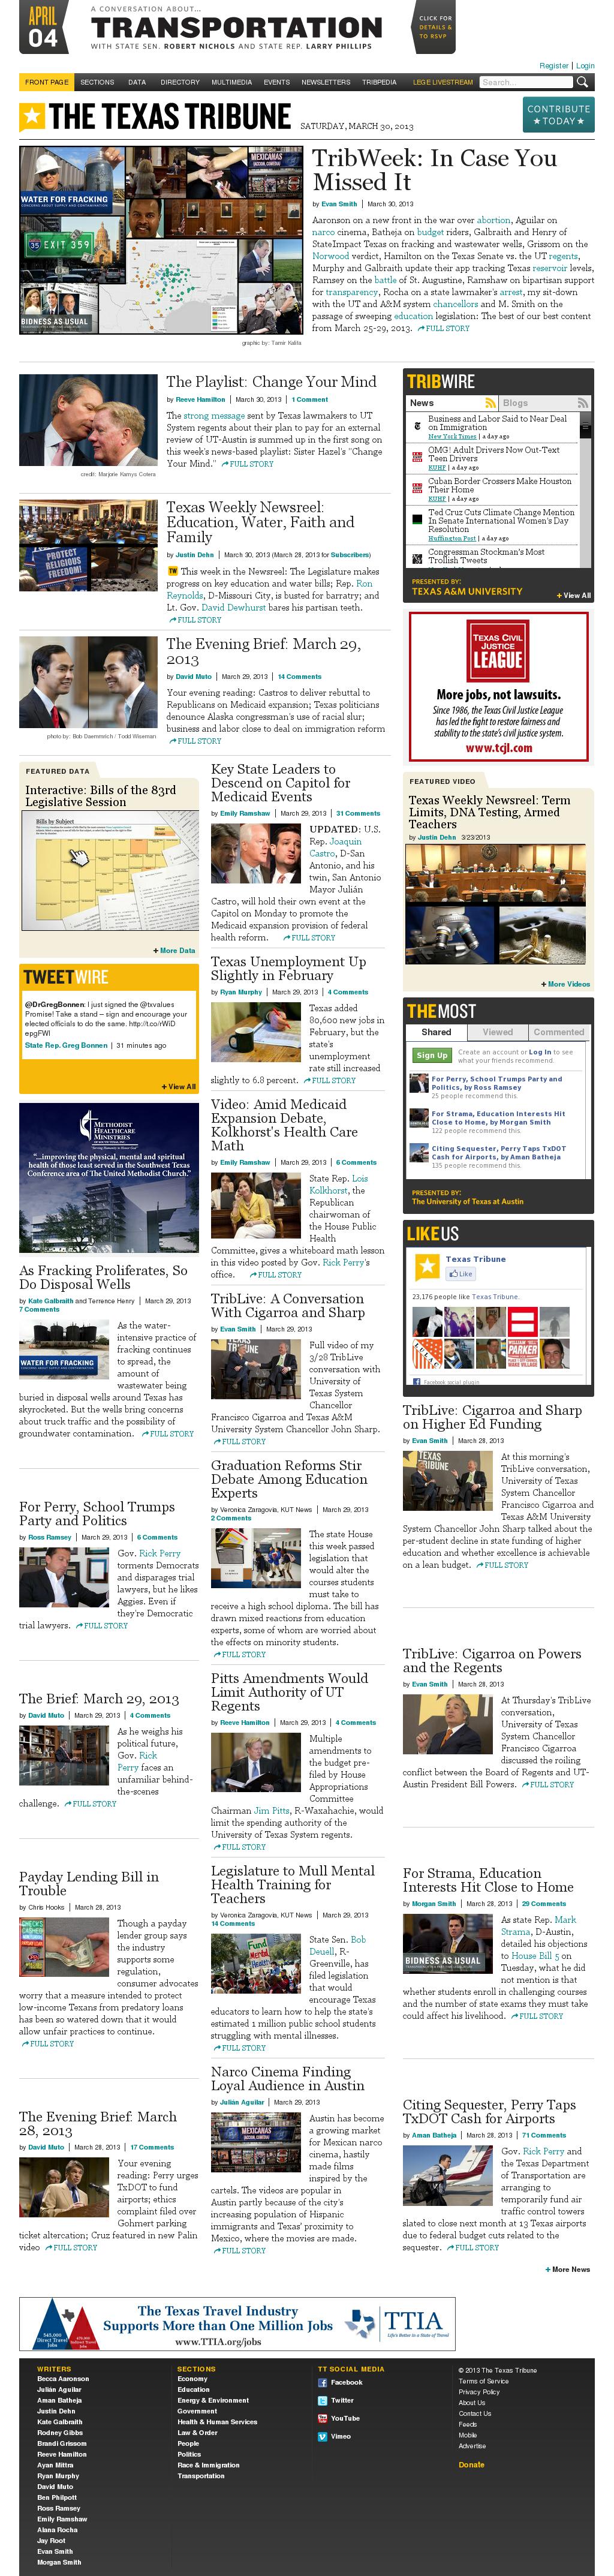 The Texas Tribune at Sunday March 31, 2013, 12:22 a.m. UTC